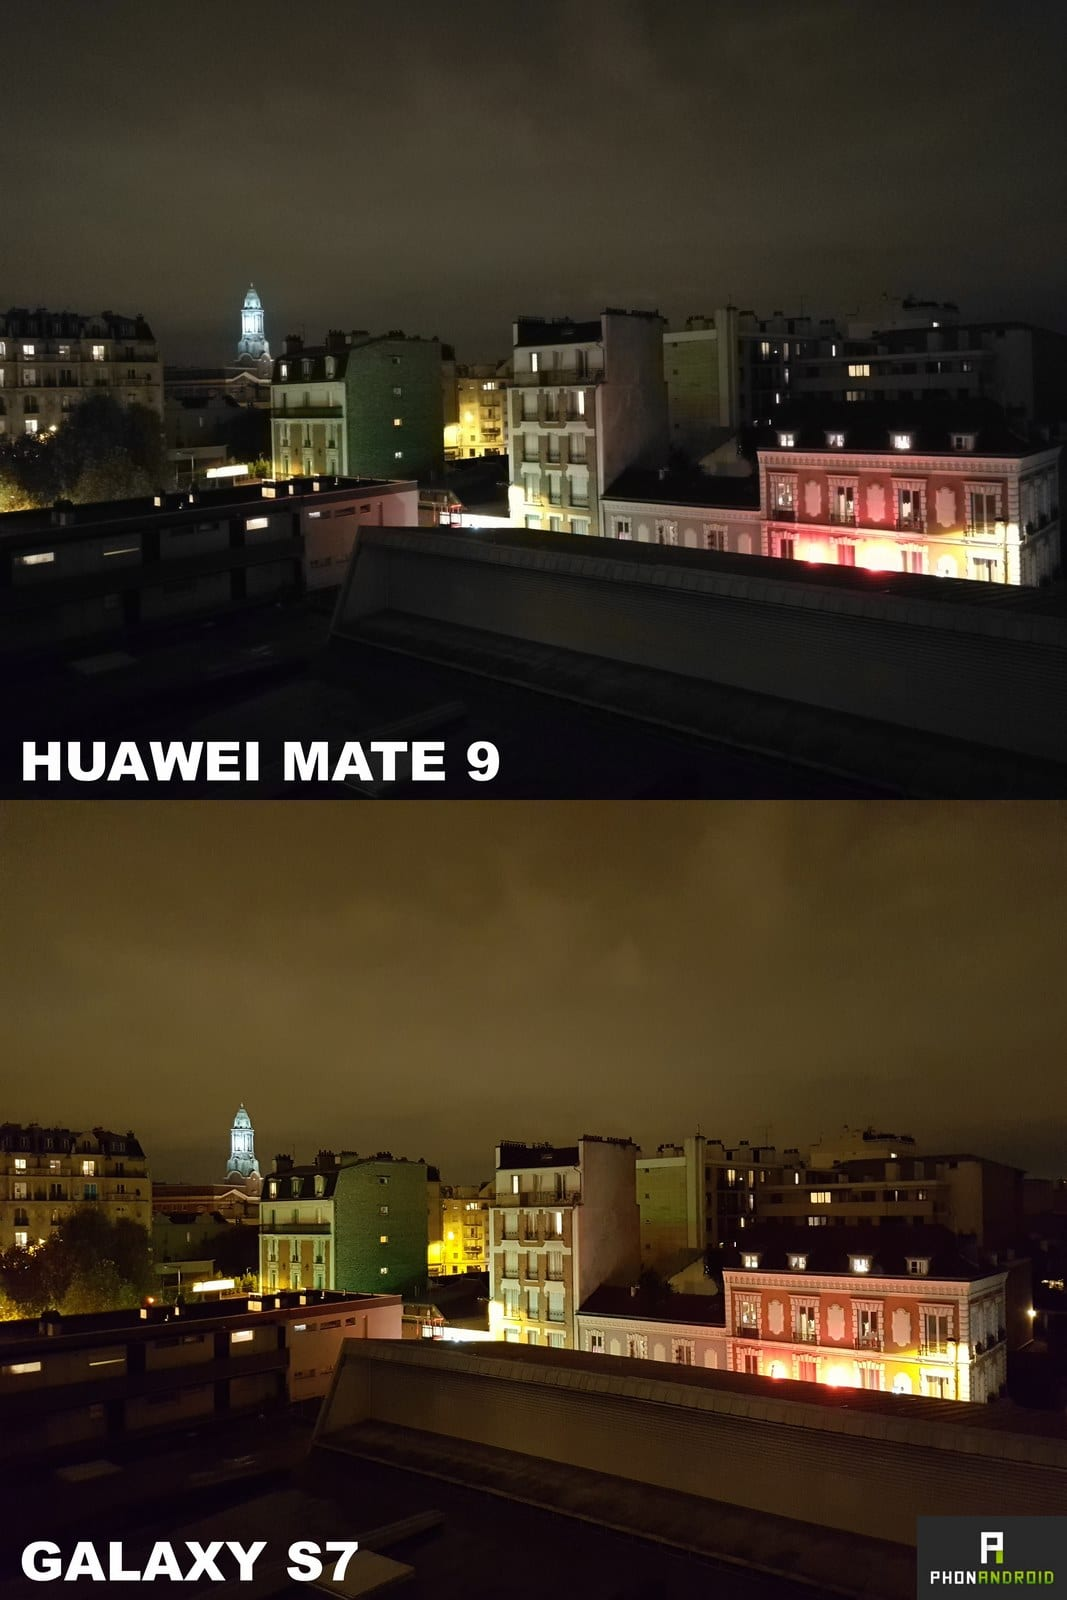 huawei mate 9 galaxy s7 photo nuit